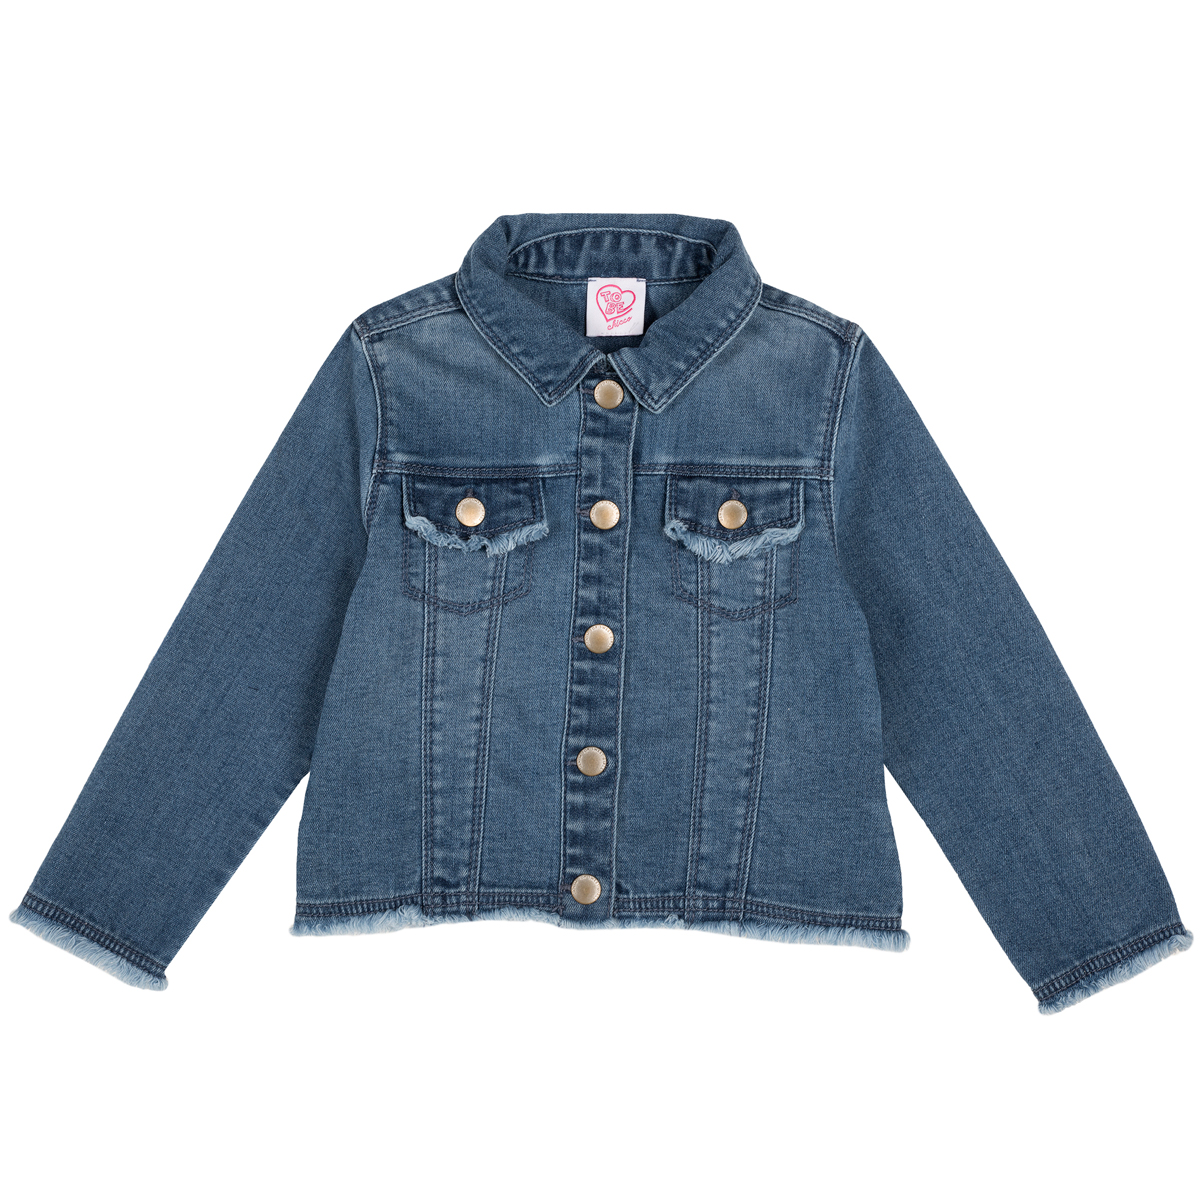 Jacheta copii Chicco, denim elastic, albastru, 87397 din categoria Jachete copii